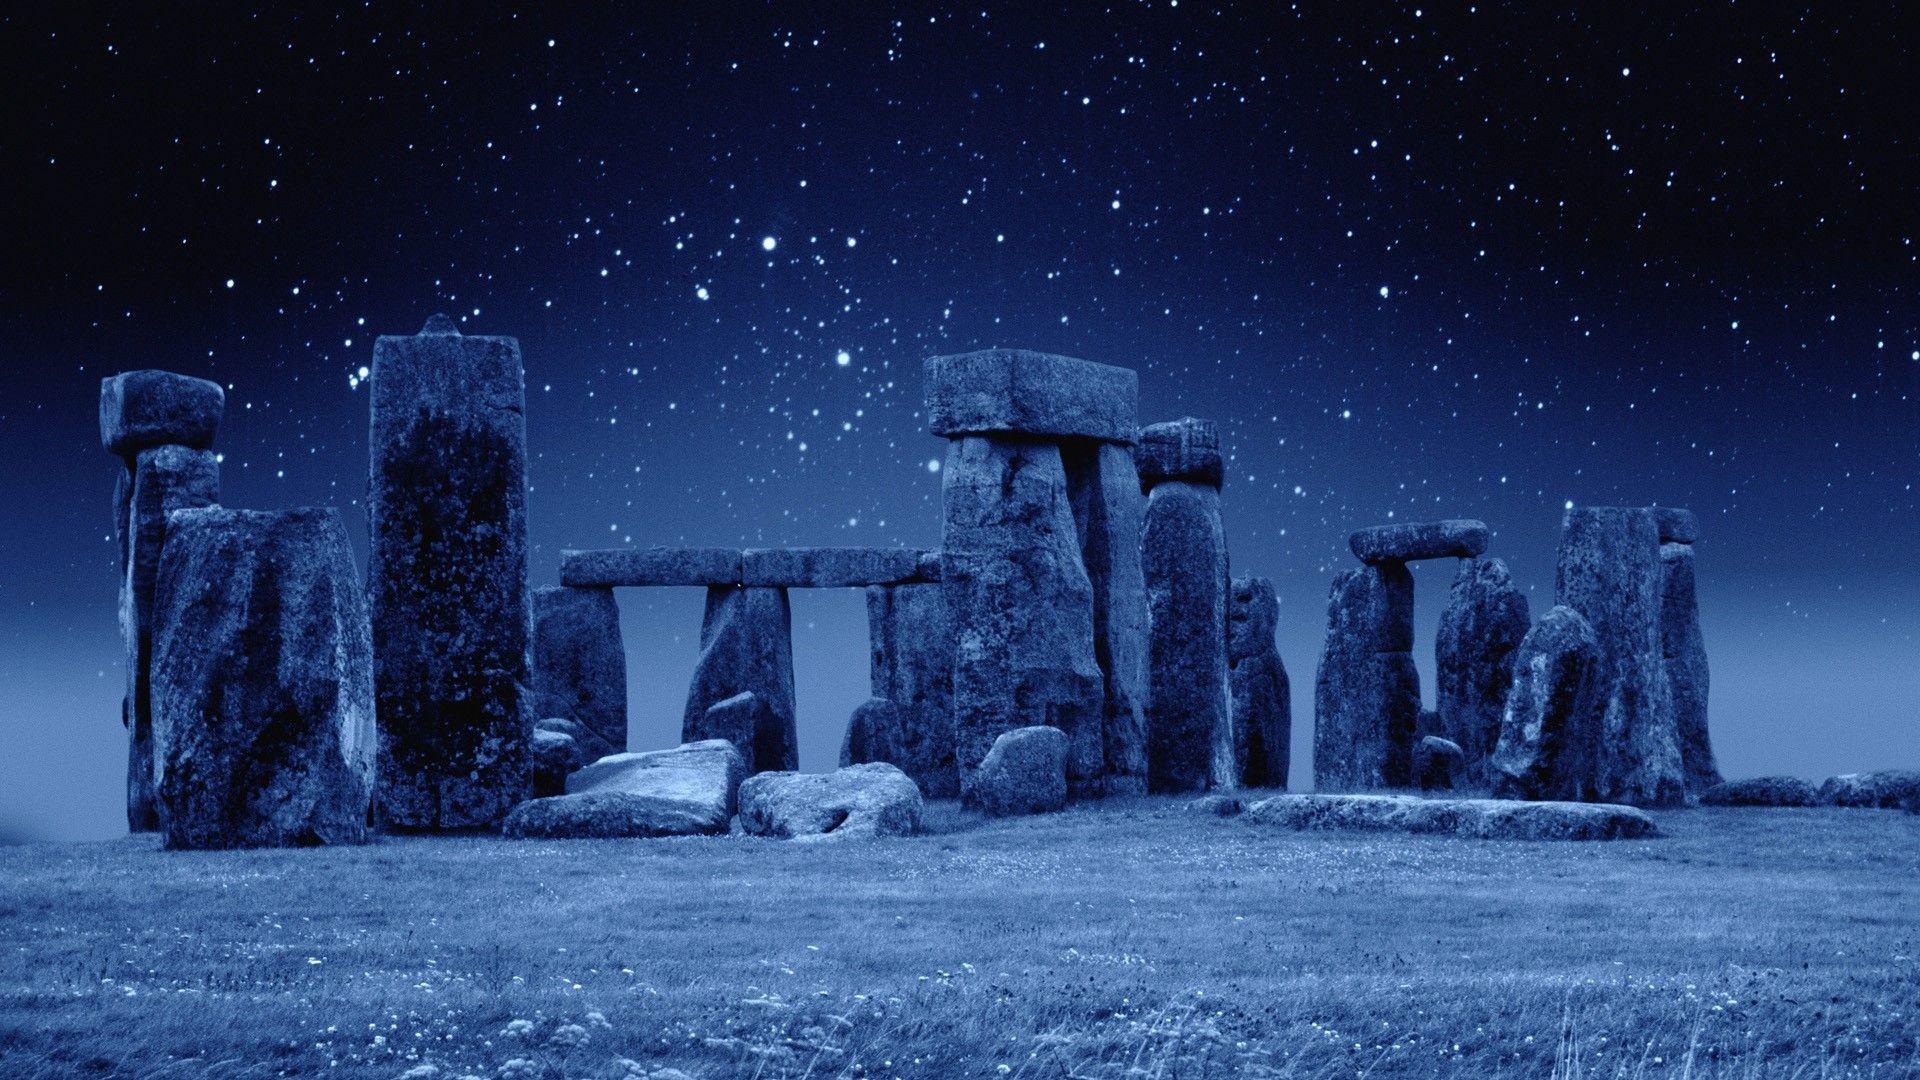 Stonehenge England Stars Stonehenge England Stars HD Wallpaper